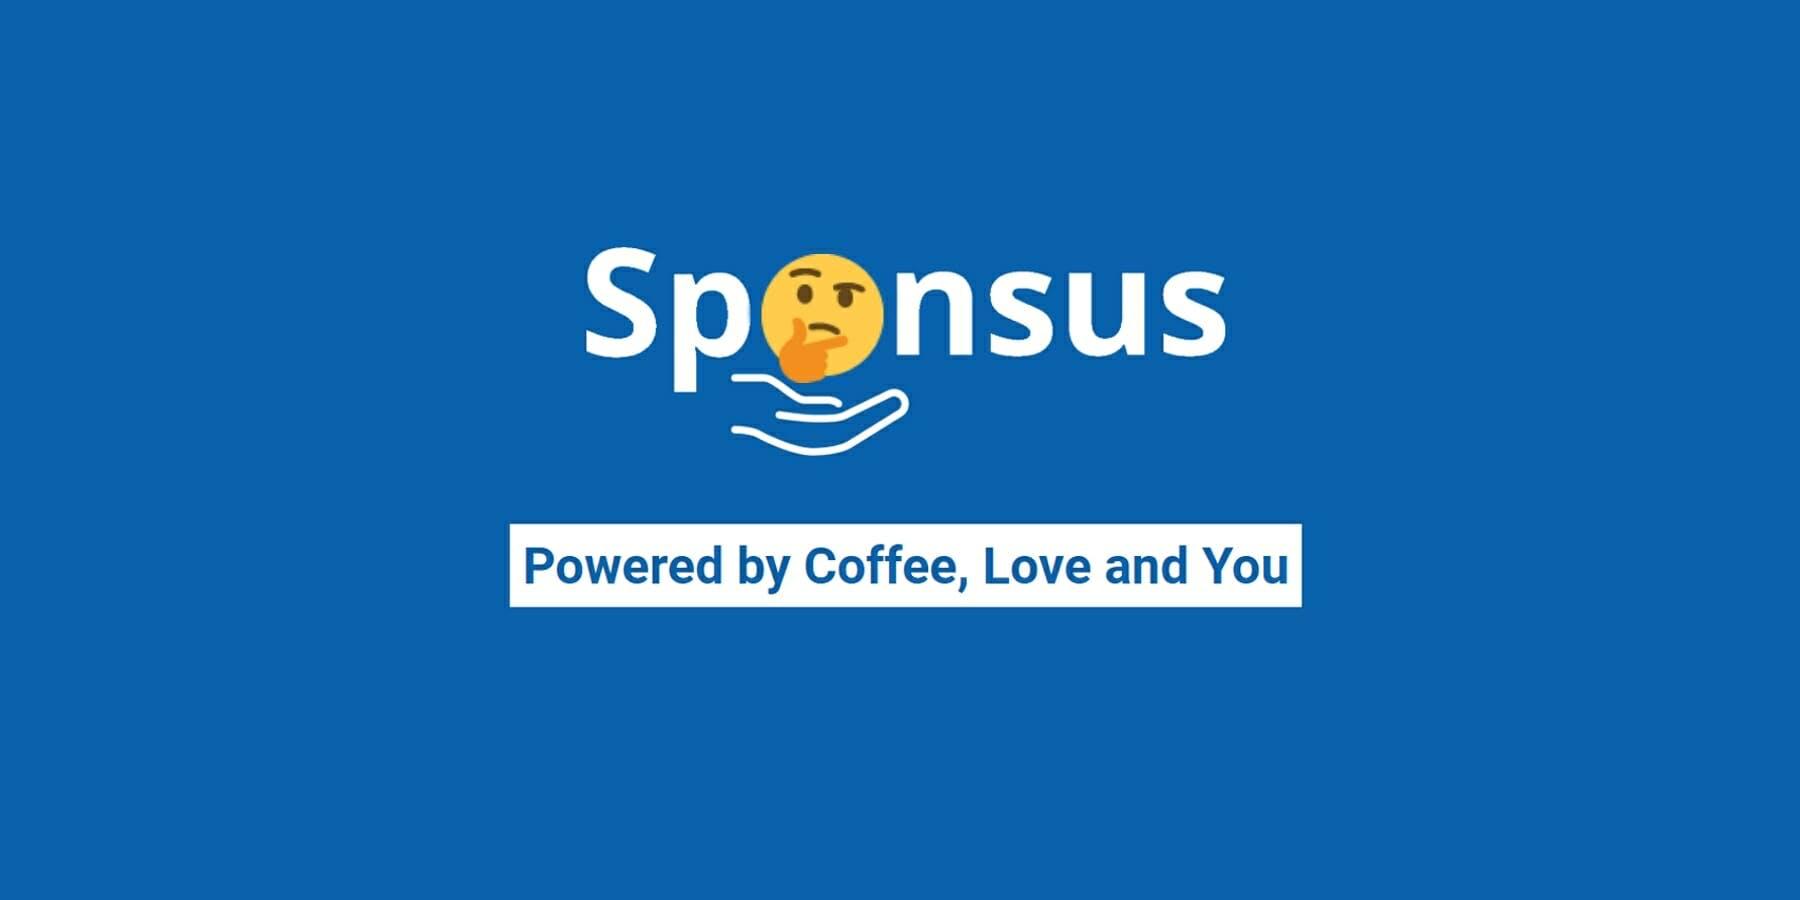 Sponsus Patreon Alternative